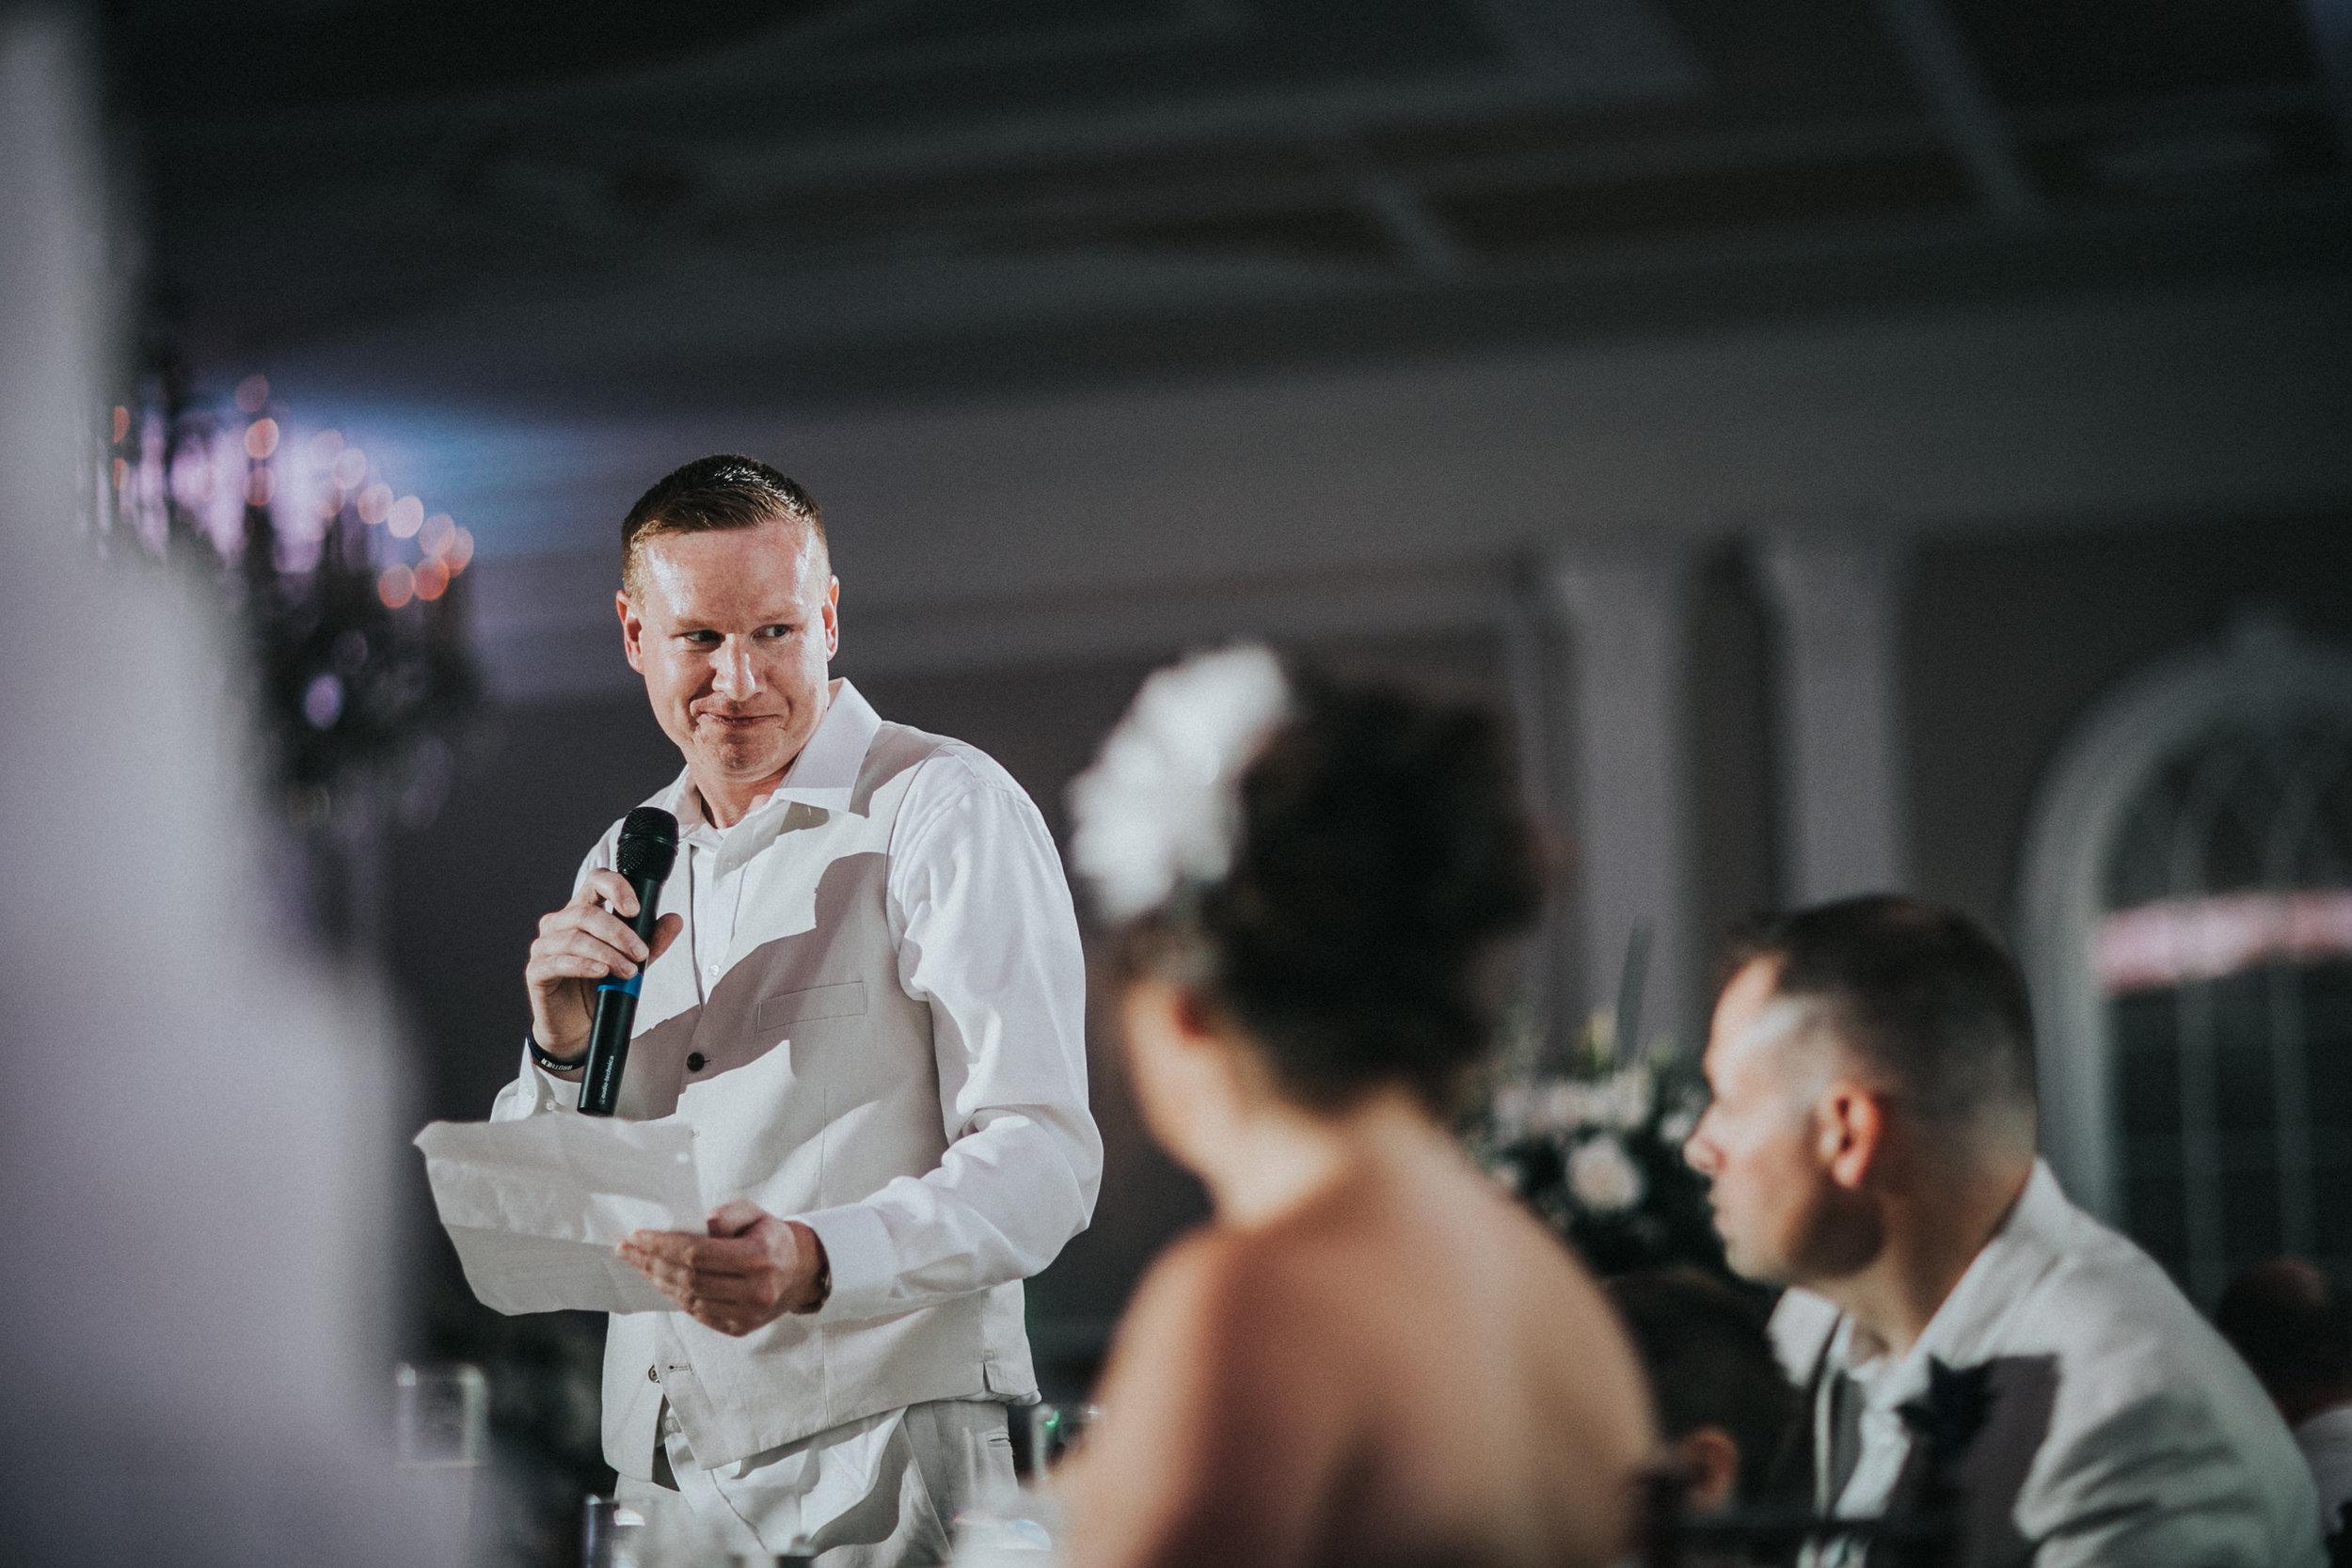 JennaLynnPhotography-NJWeddingPhotographer-Wedding-TheBerkeley-AsburyPark-Allison&Michael-Reception-99.jpg